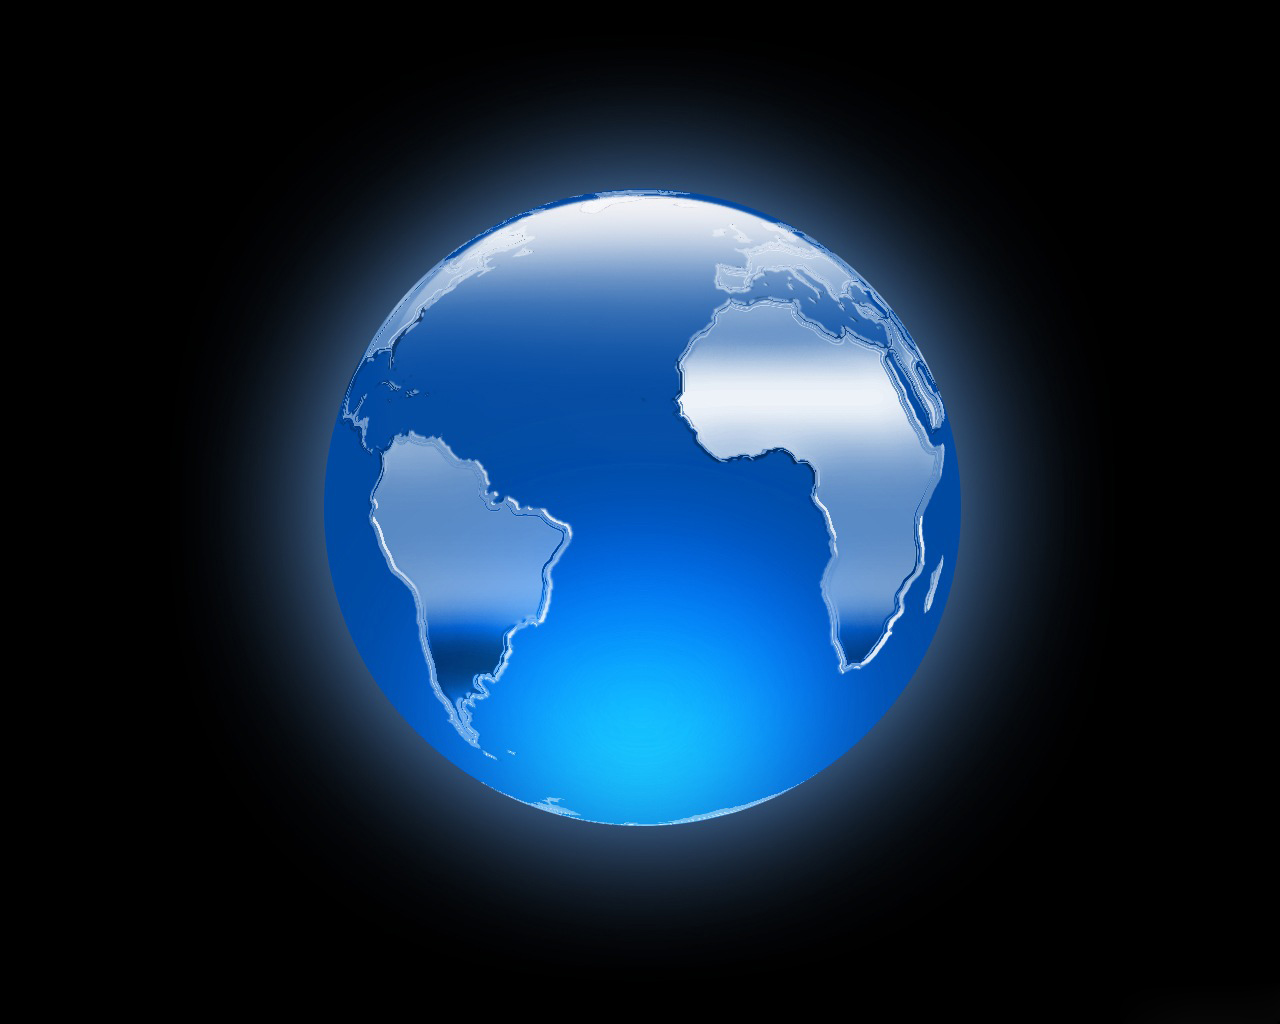 http://3.bp.blogspot.com/-Uk0LHleKRgc/TcuBmHt5k0I/AAAAAAAAAfM/3T_DPVONx8c/s1600/Earth_Wallpaper_desktop.jpg